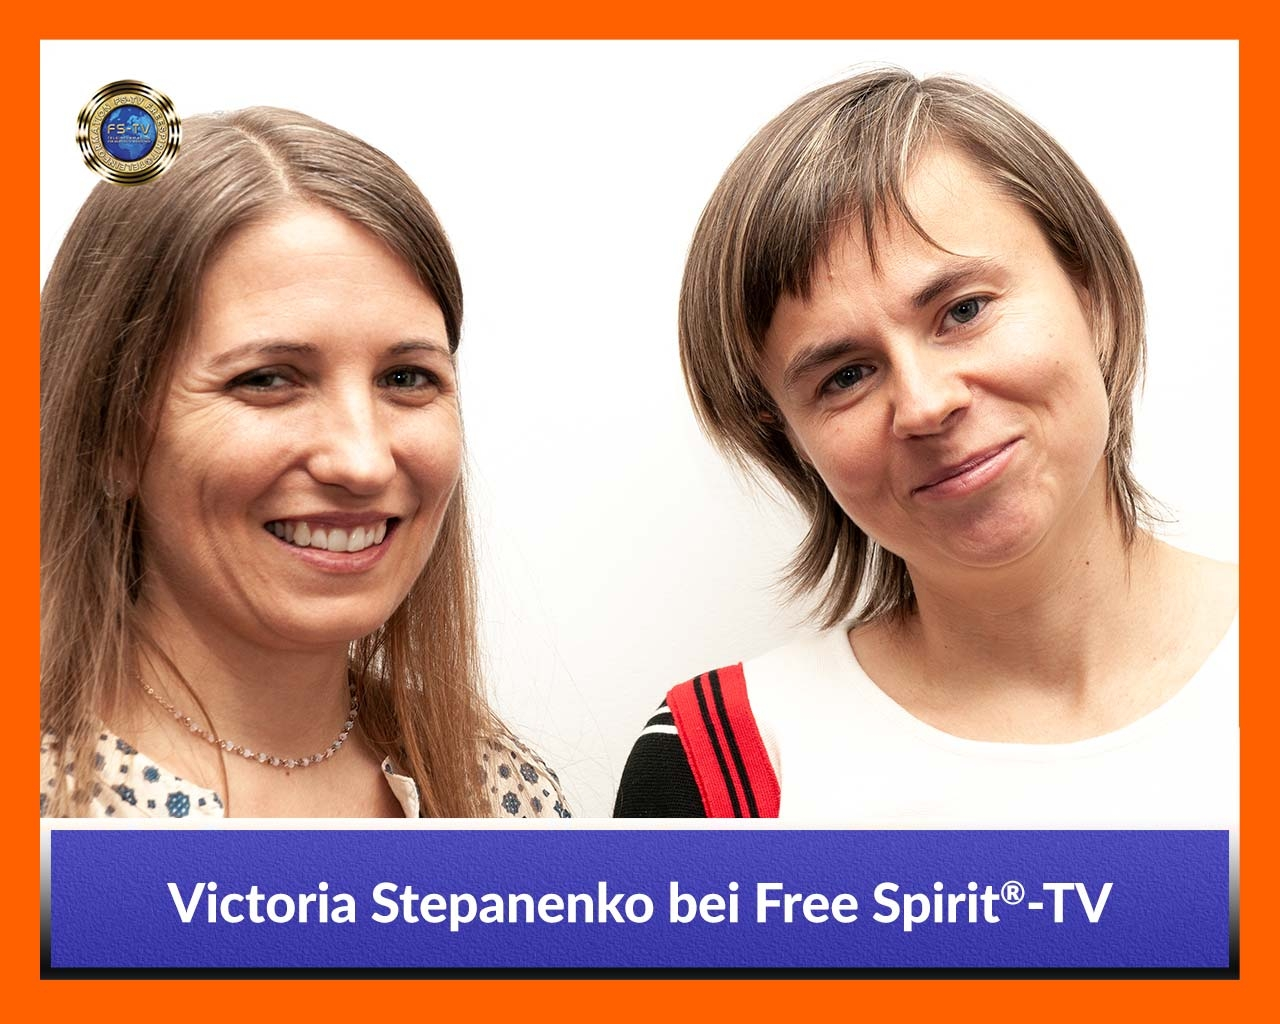 Galleriebild-Victoria-Stepanenko-09